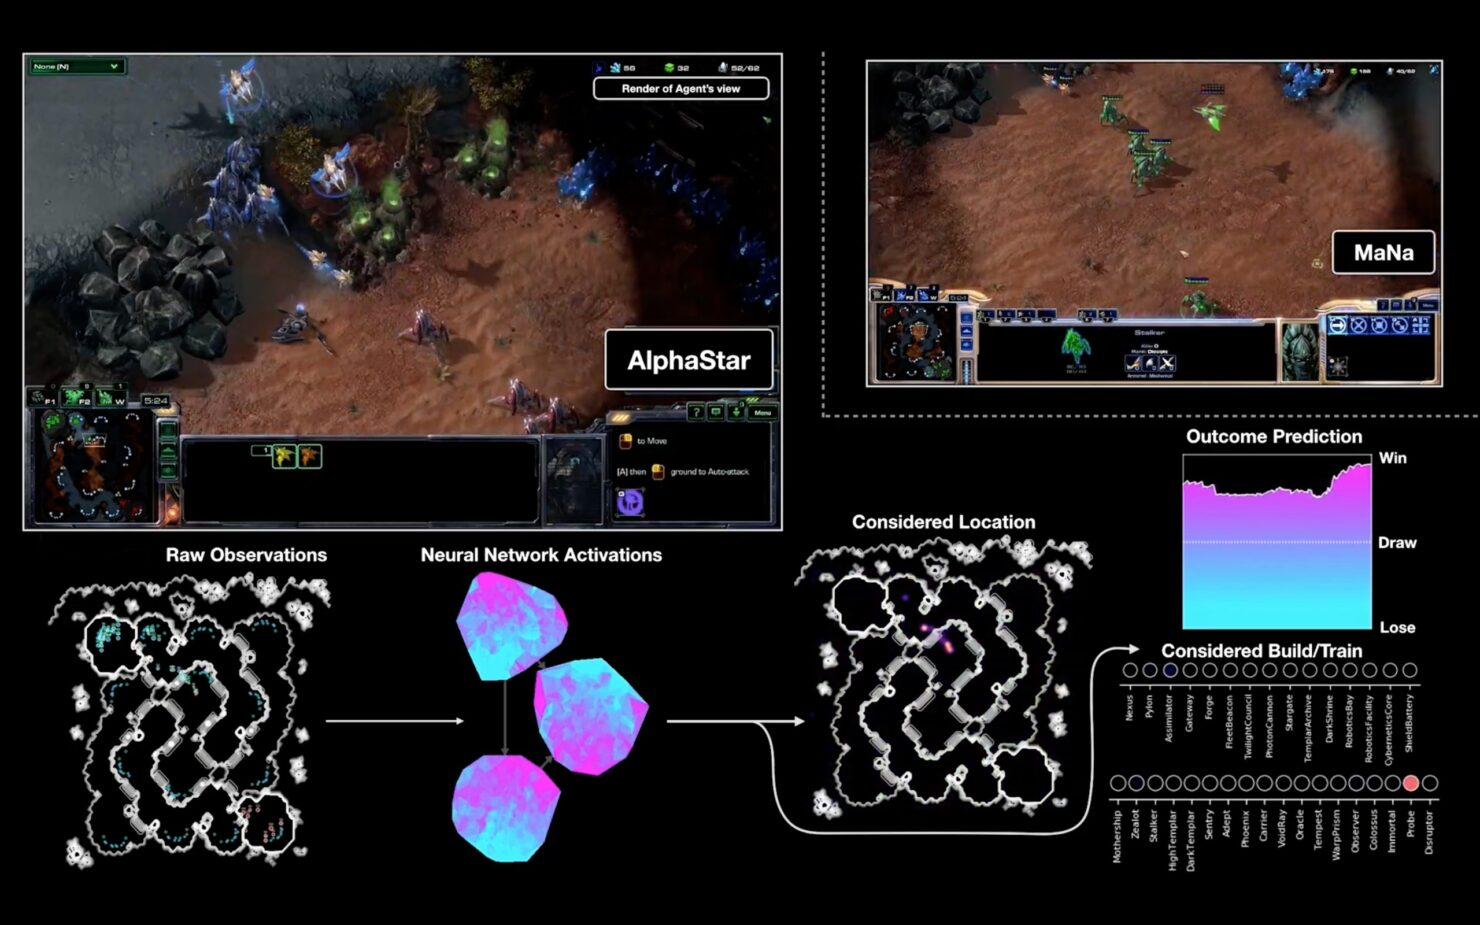 deepmind-alphastar-starcraft-ii